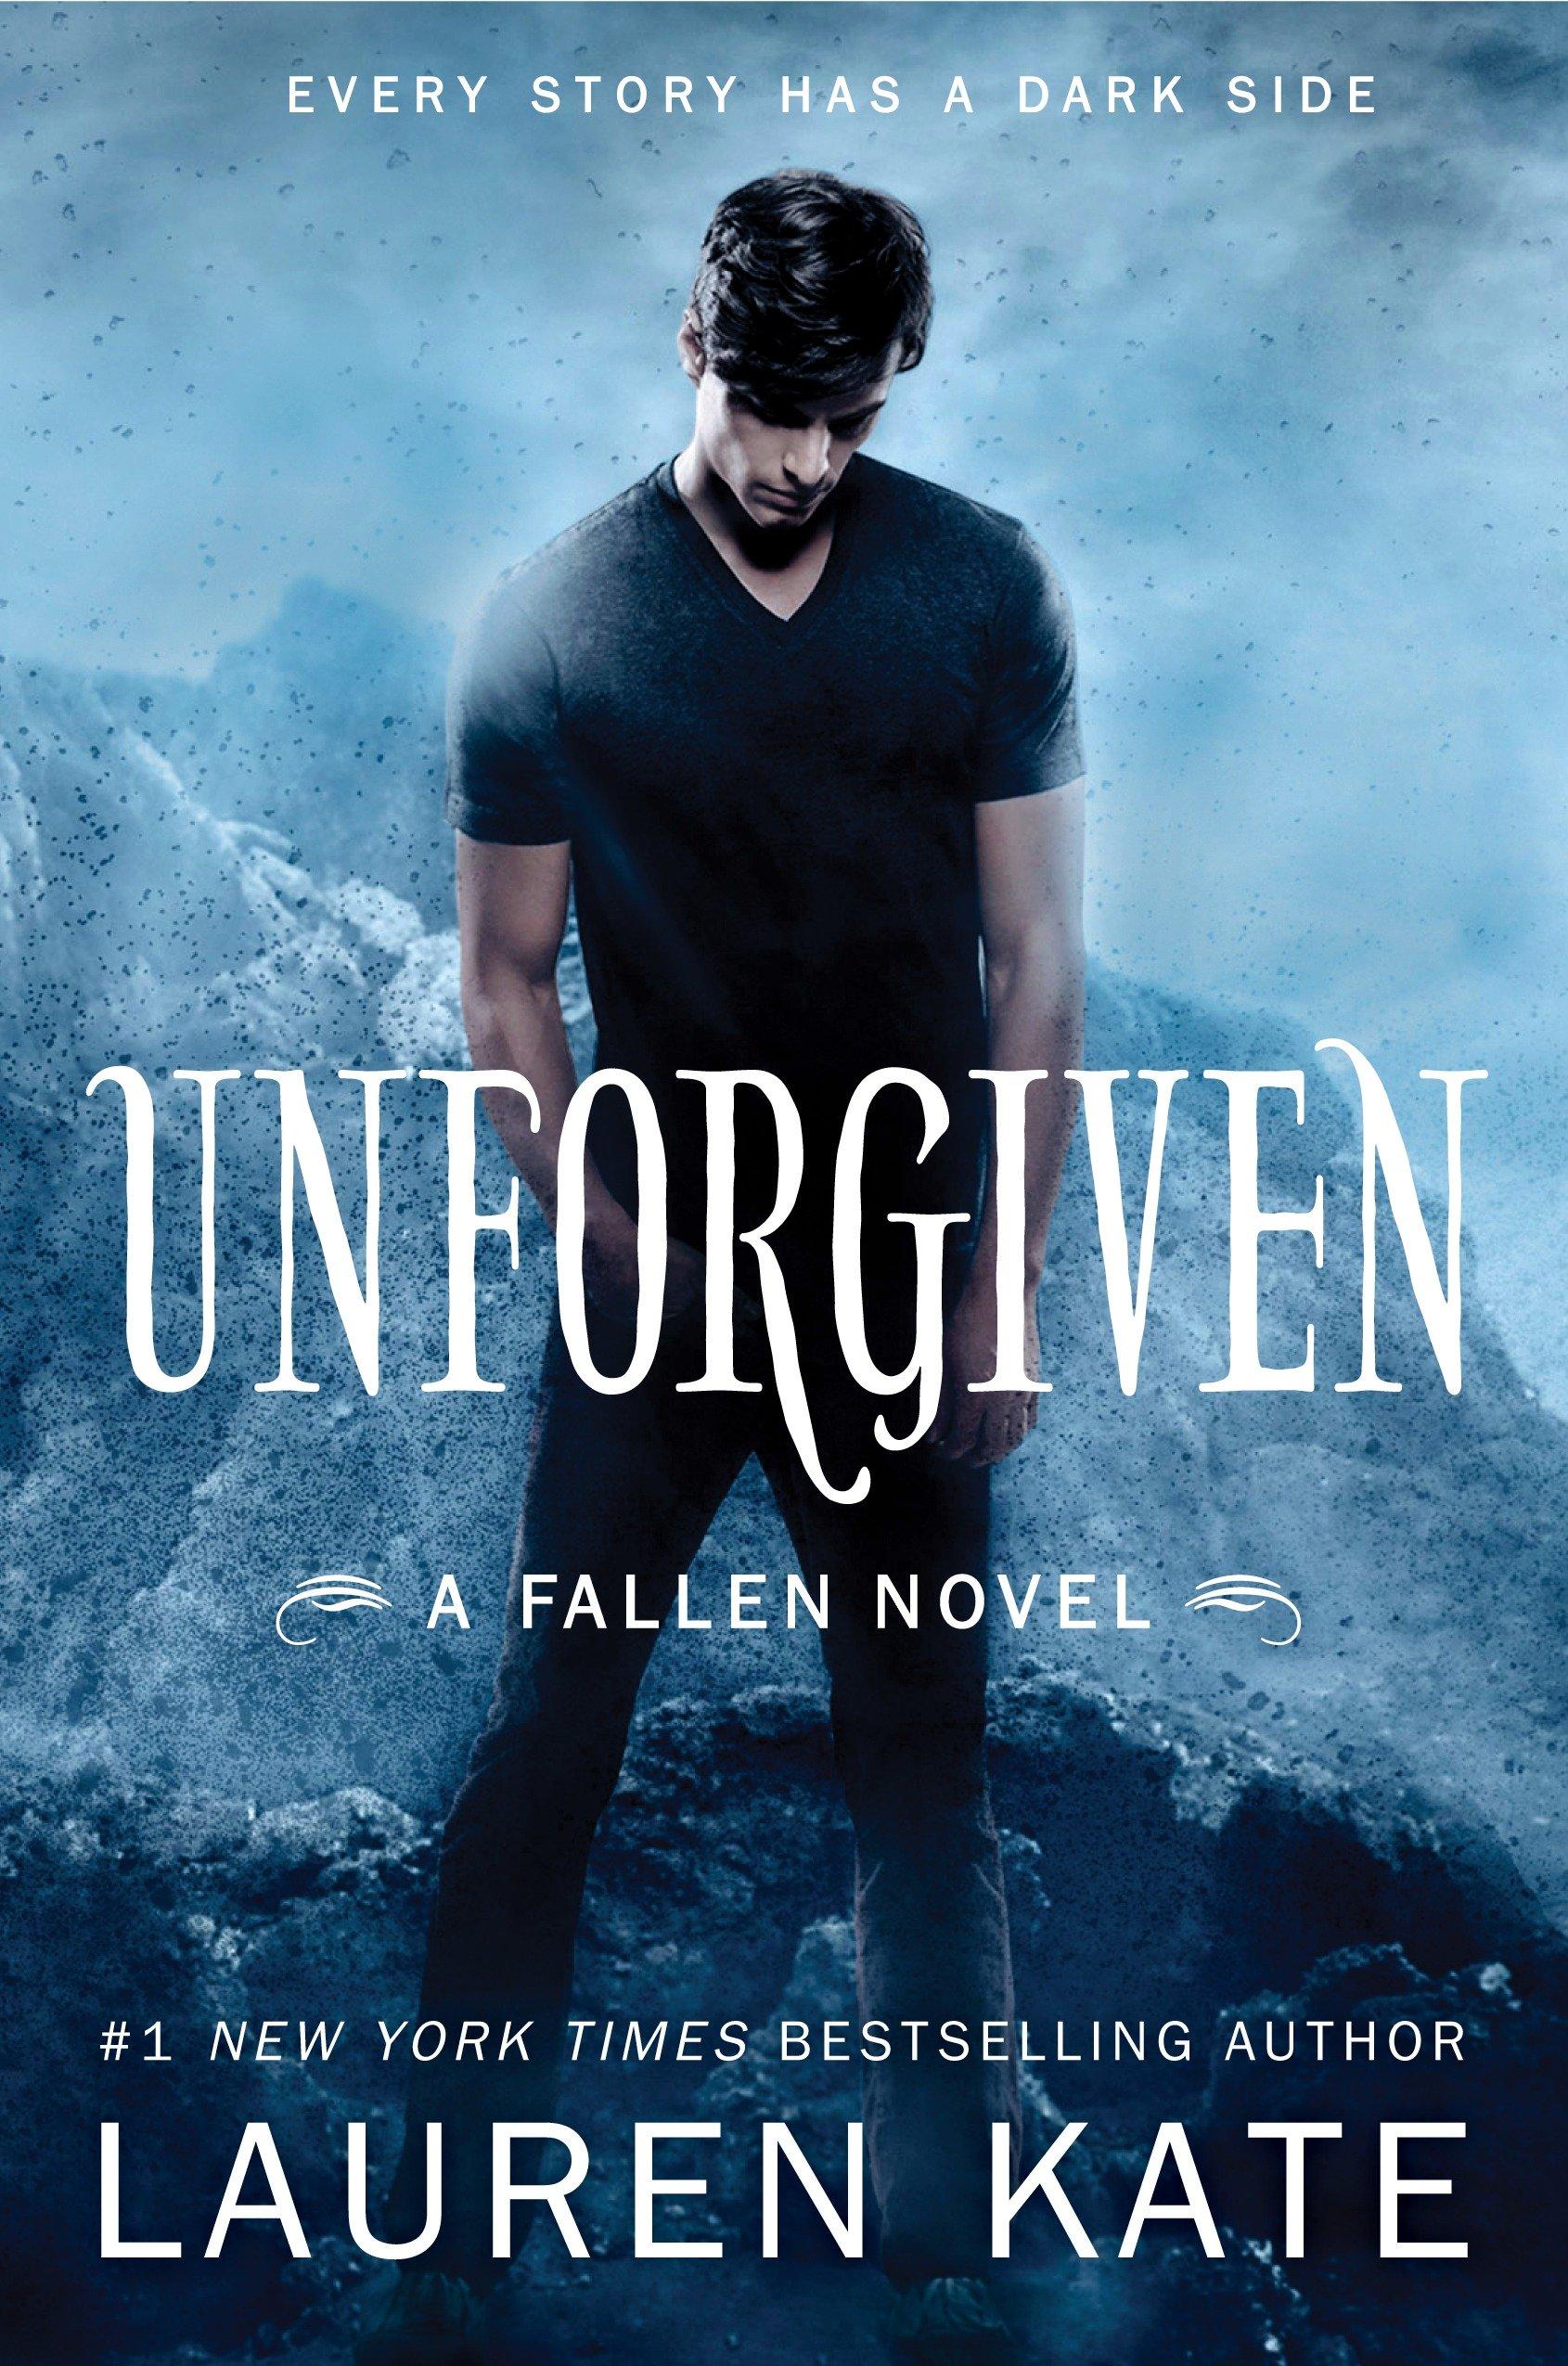 Unforgiven cover image